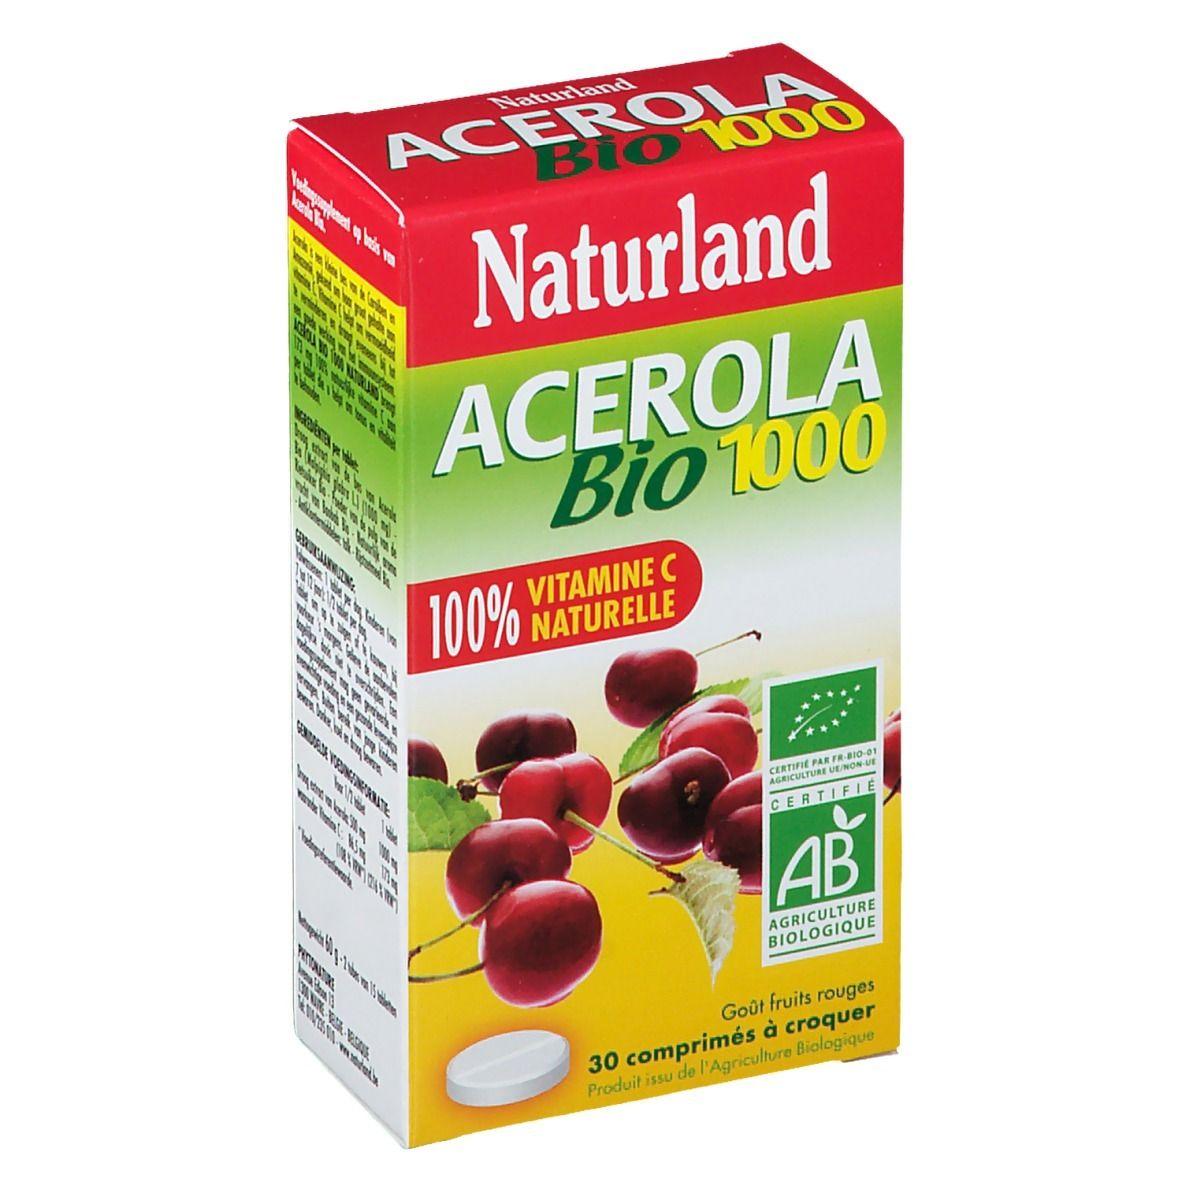 Naturland ACEROLA Bio 1000 pc(s) comprimé(s)